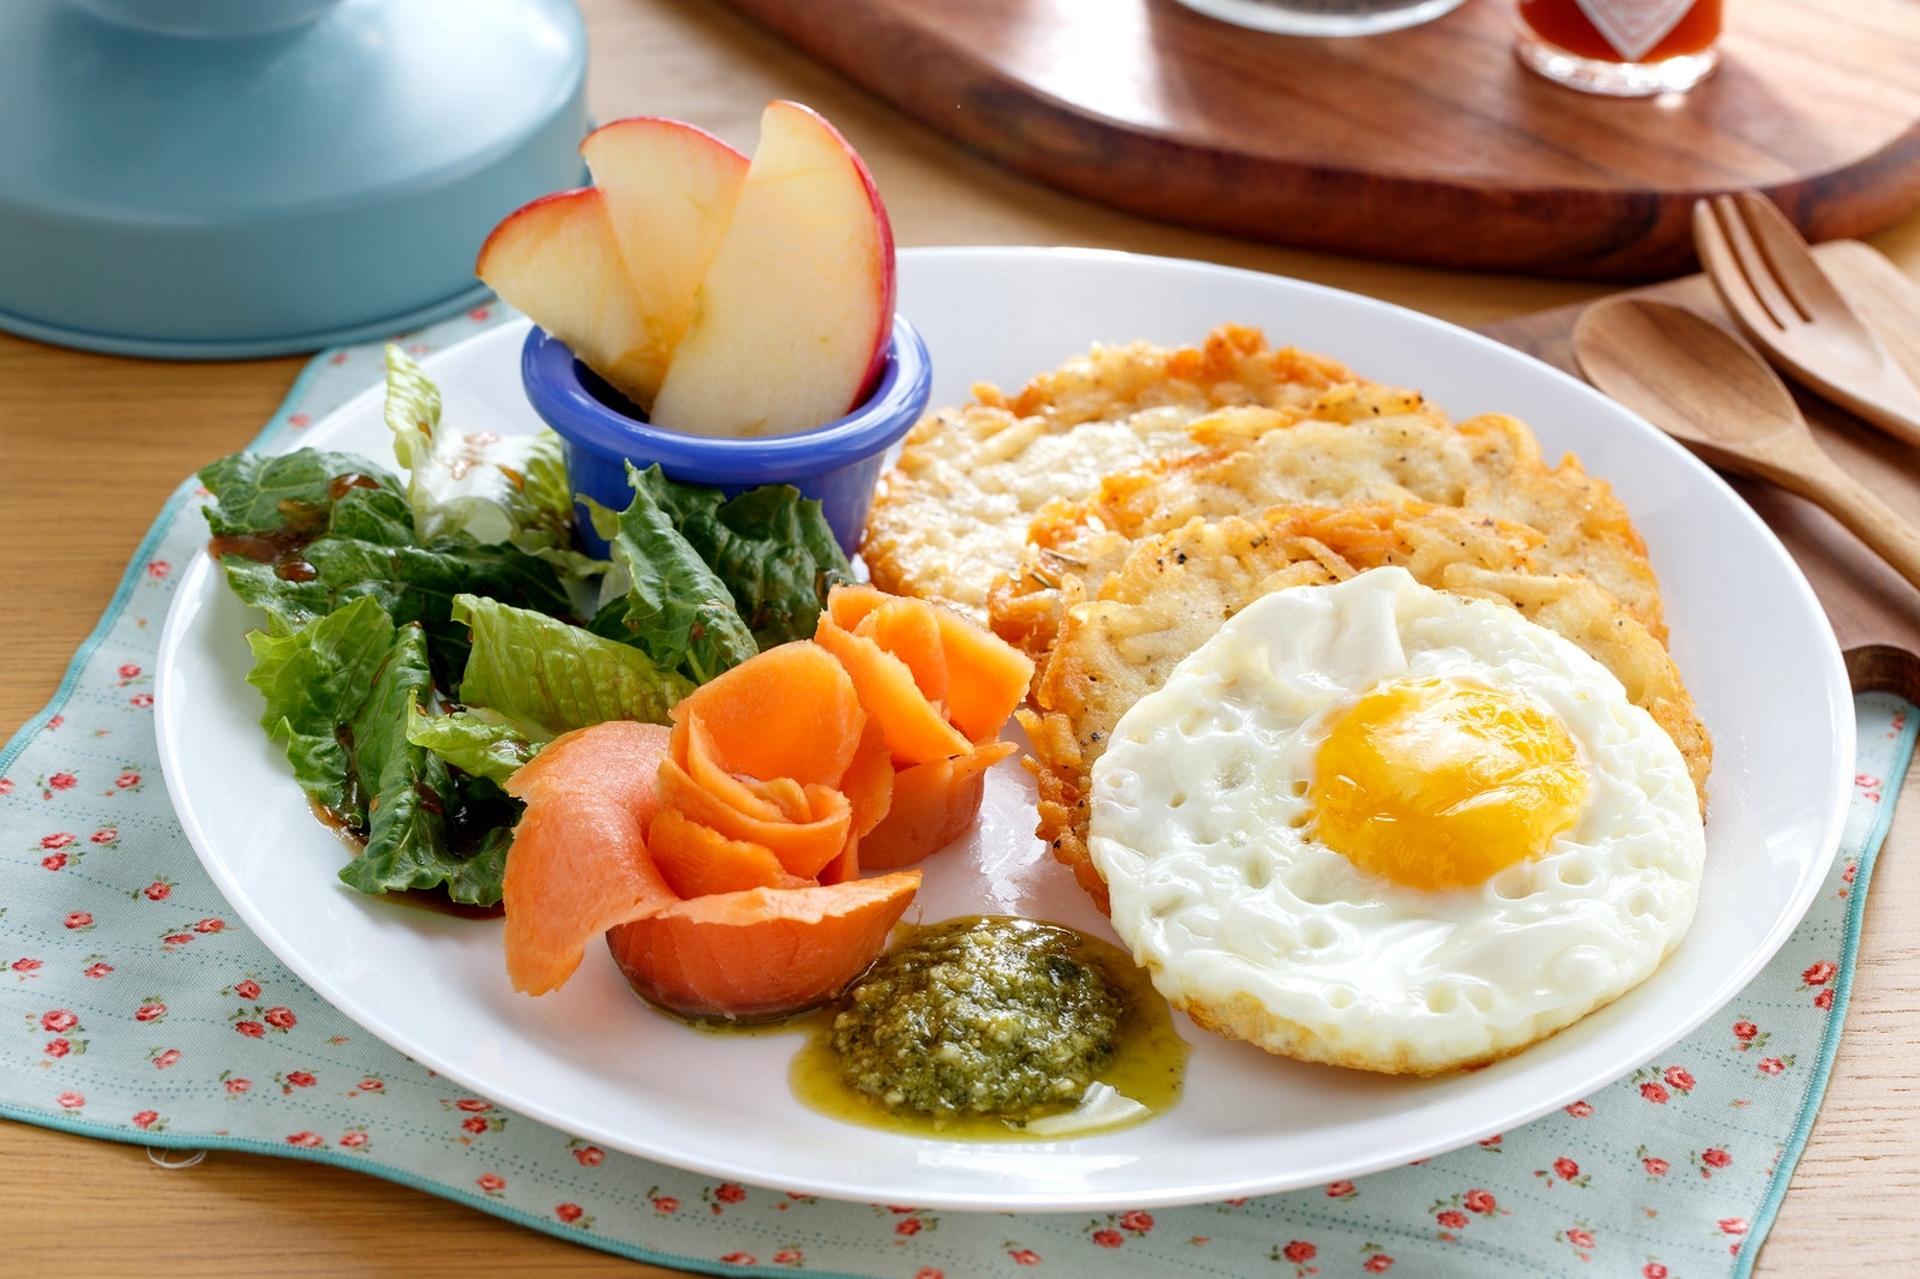 еда яйца графика планеты food eggs graphics planet без смс